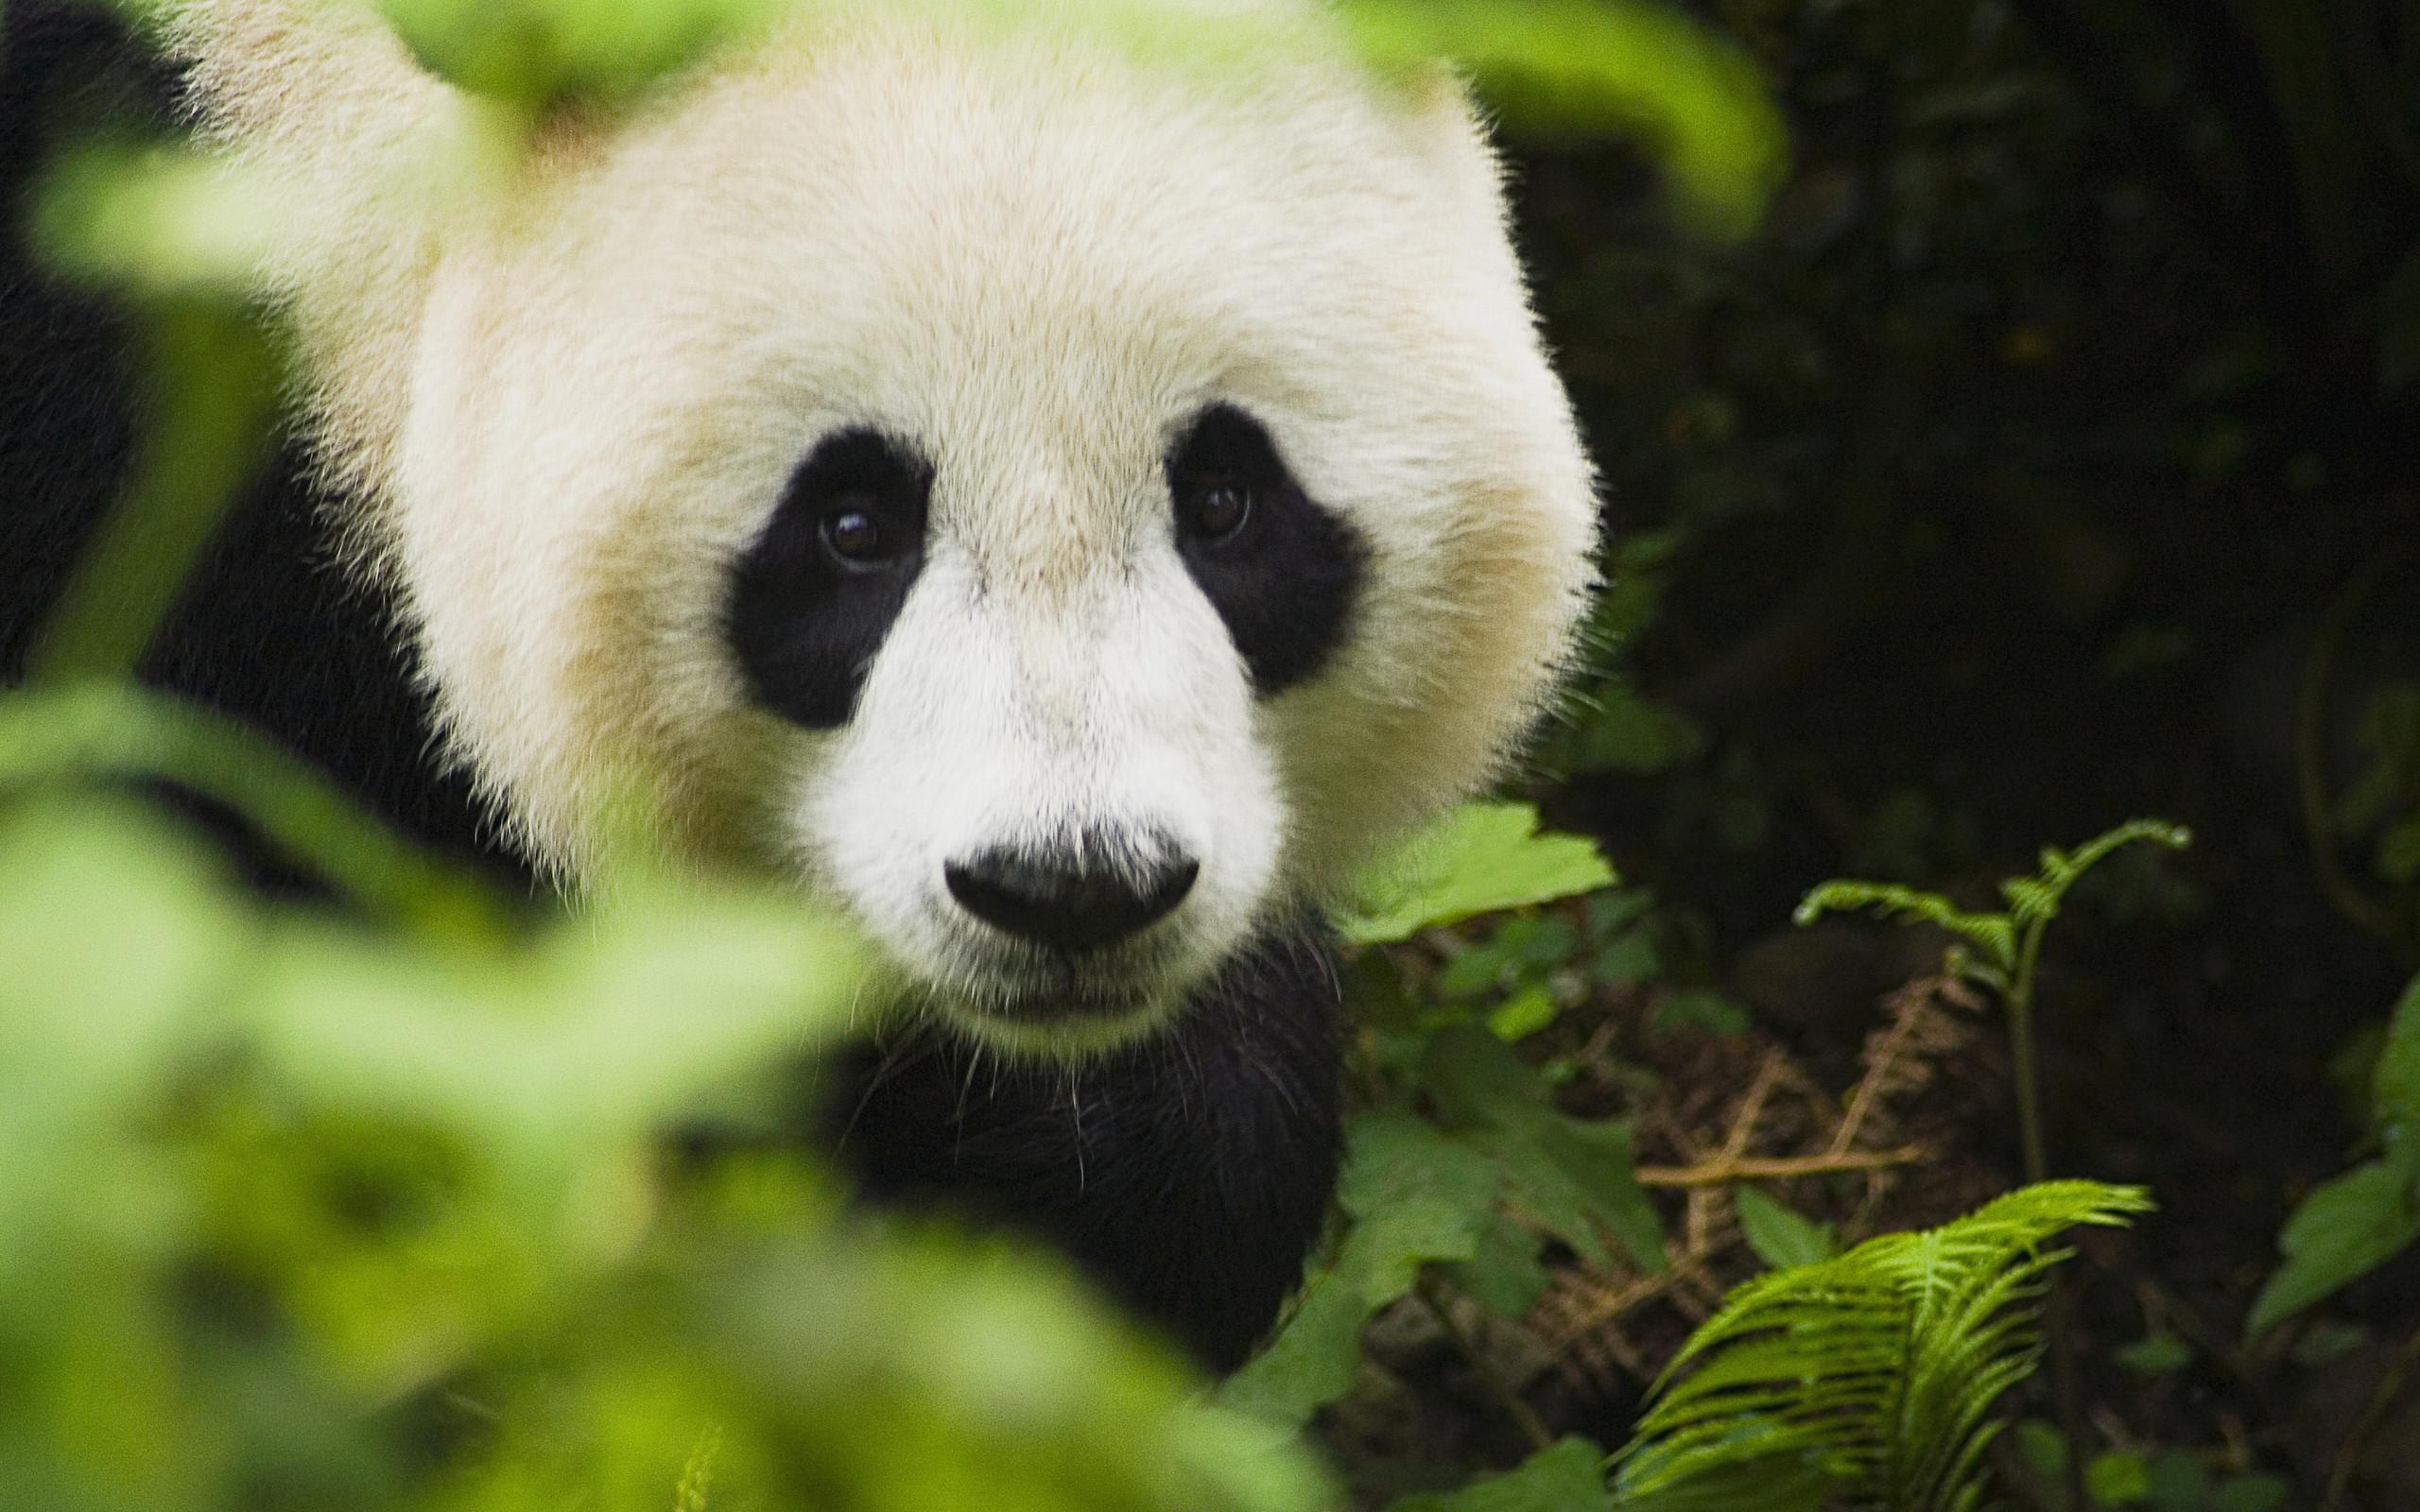 Panda Wallpaper for Computer (57+ images)